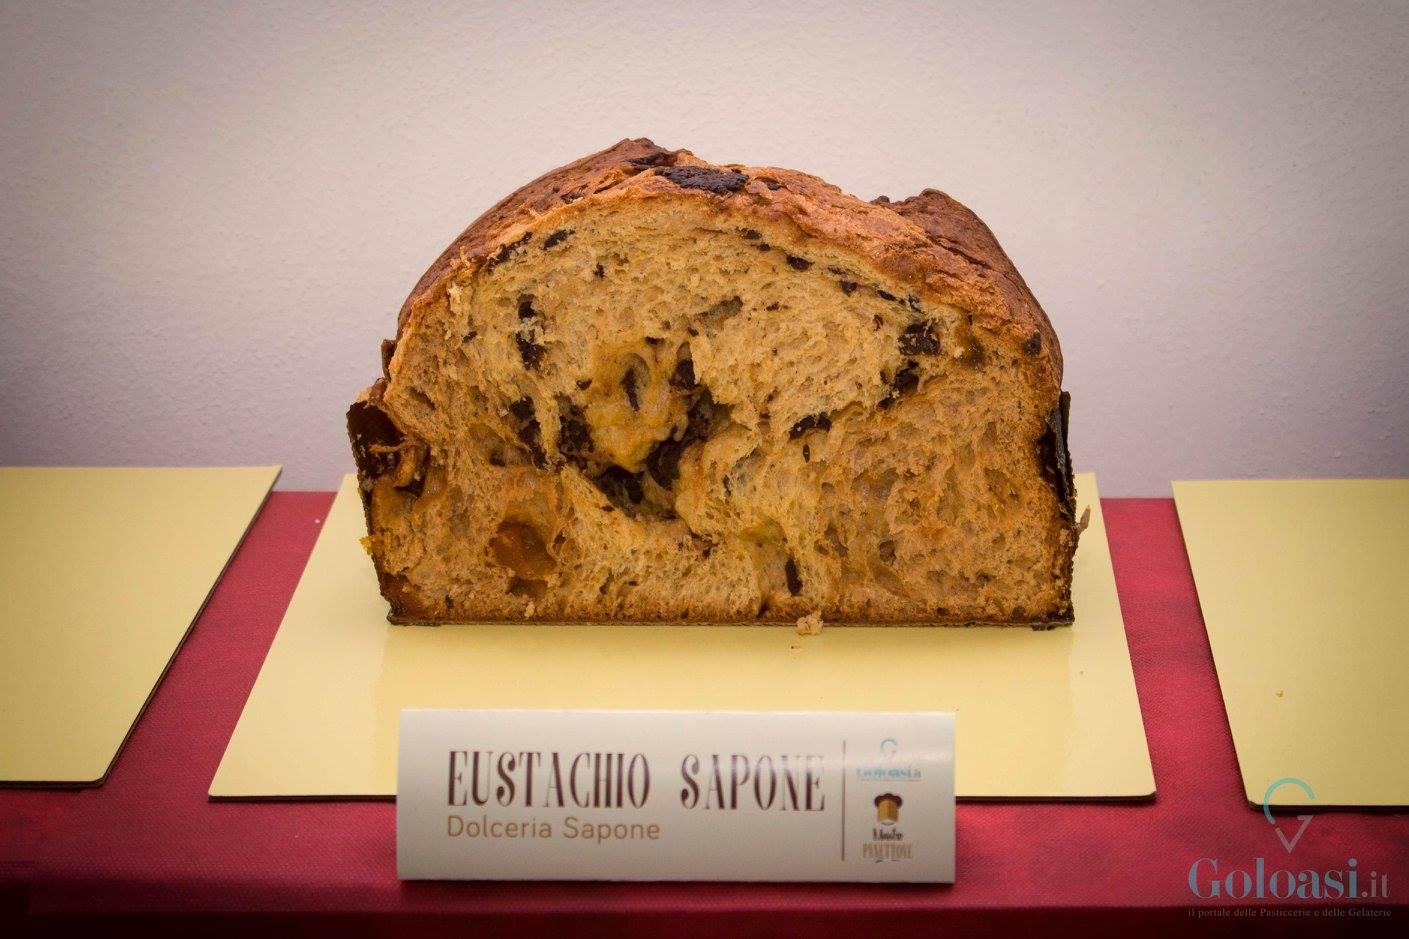 panettone-cioccolato-eustachio-sapone